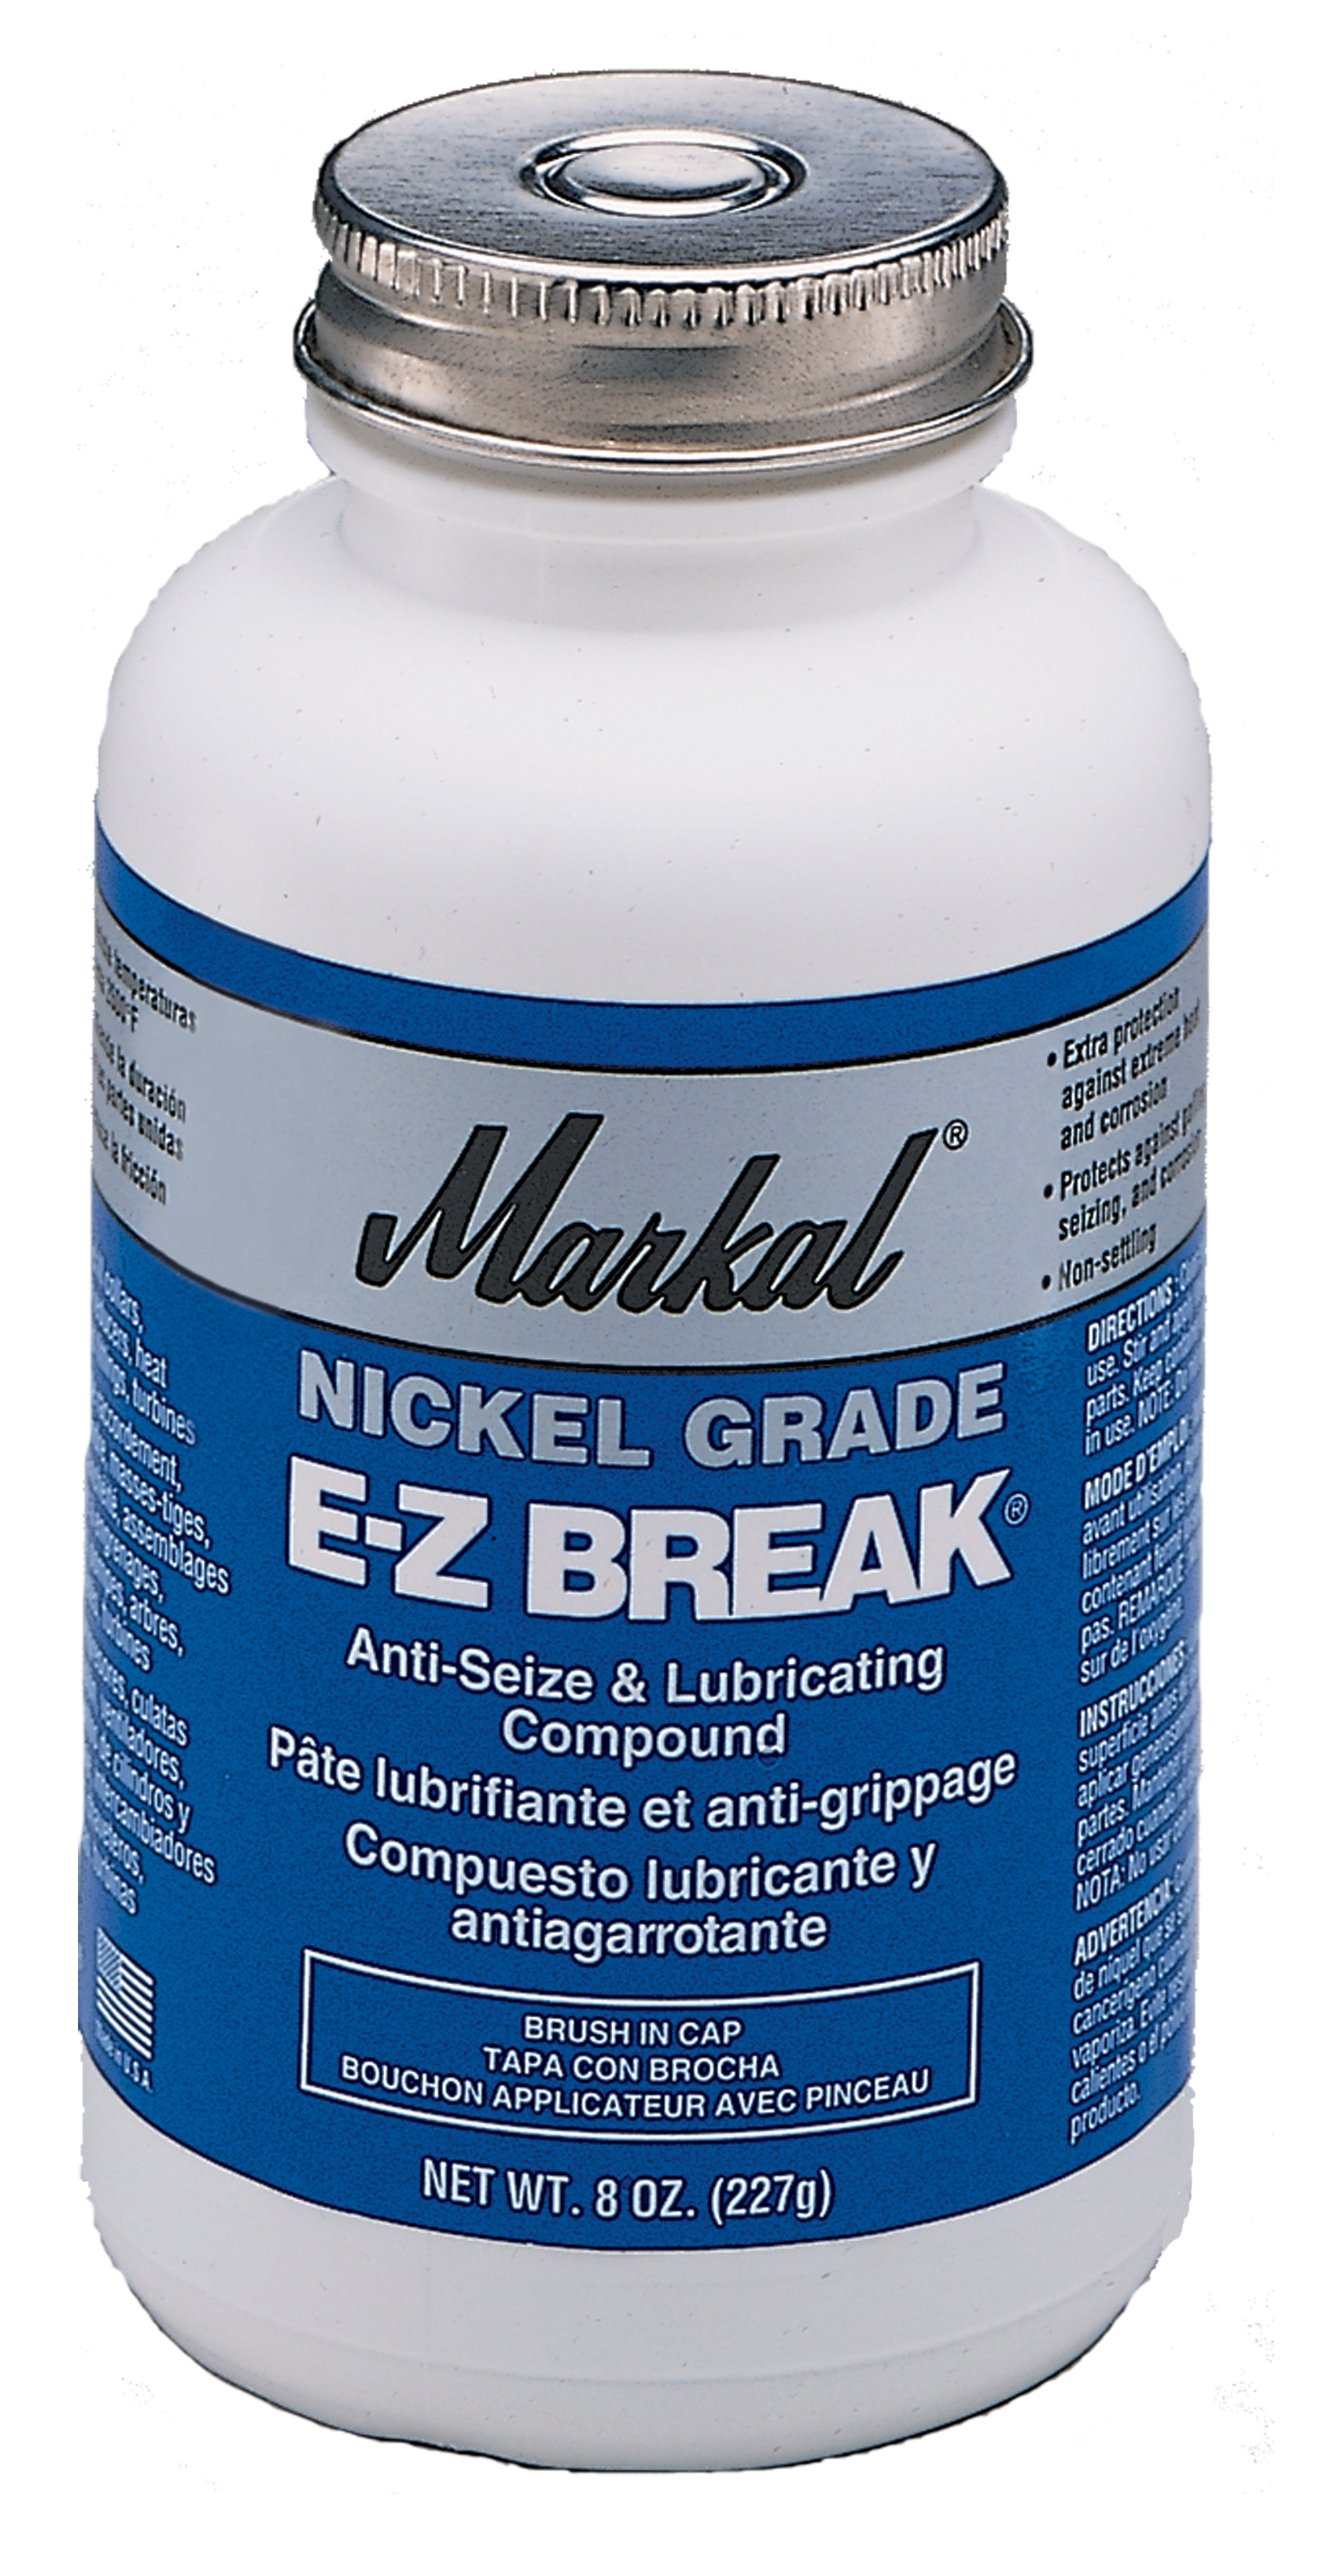 LA-CO EZ Break Nickel Grade Antiseize Paste, 2600 Degree F Temperature, 42 lbs